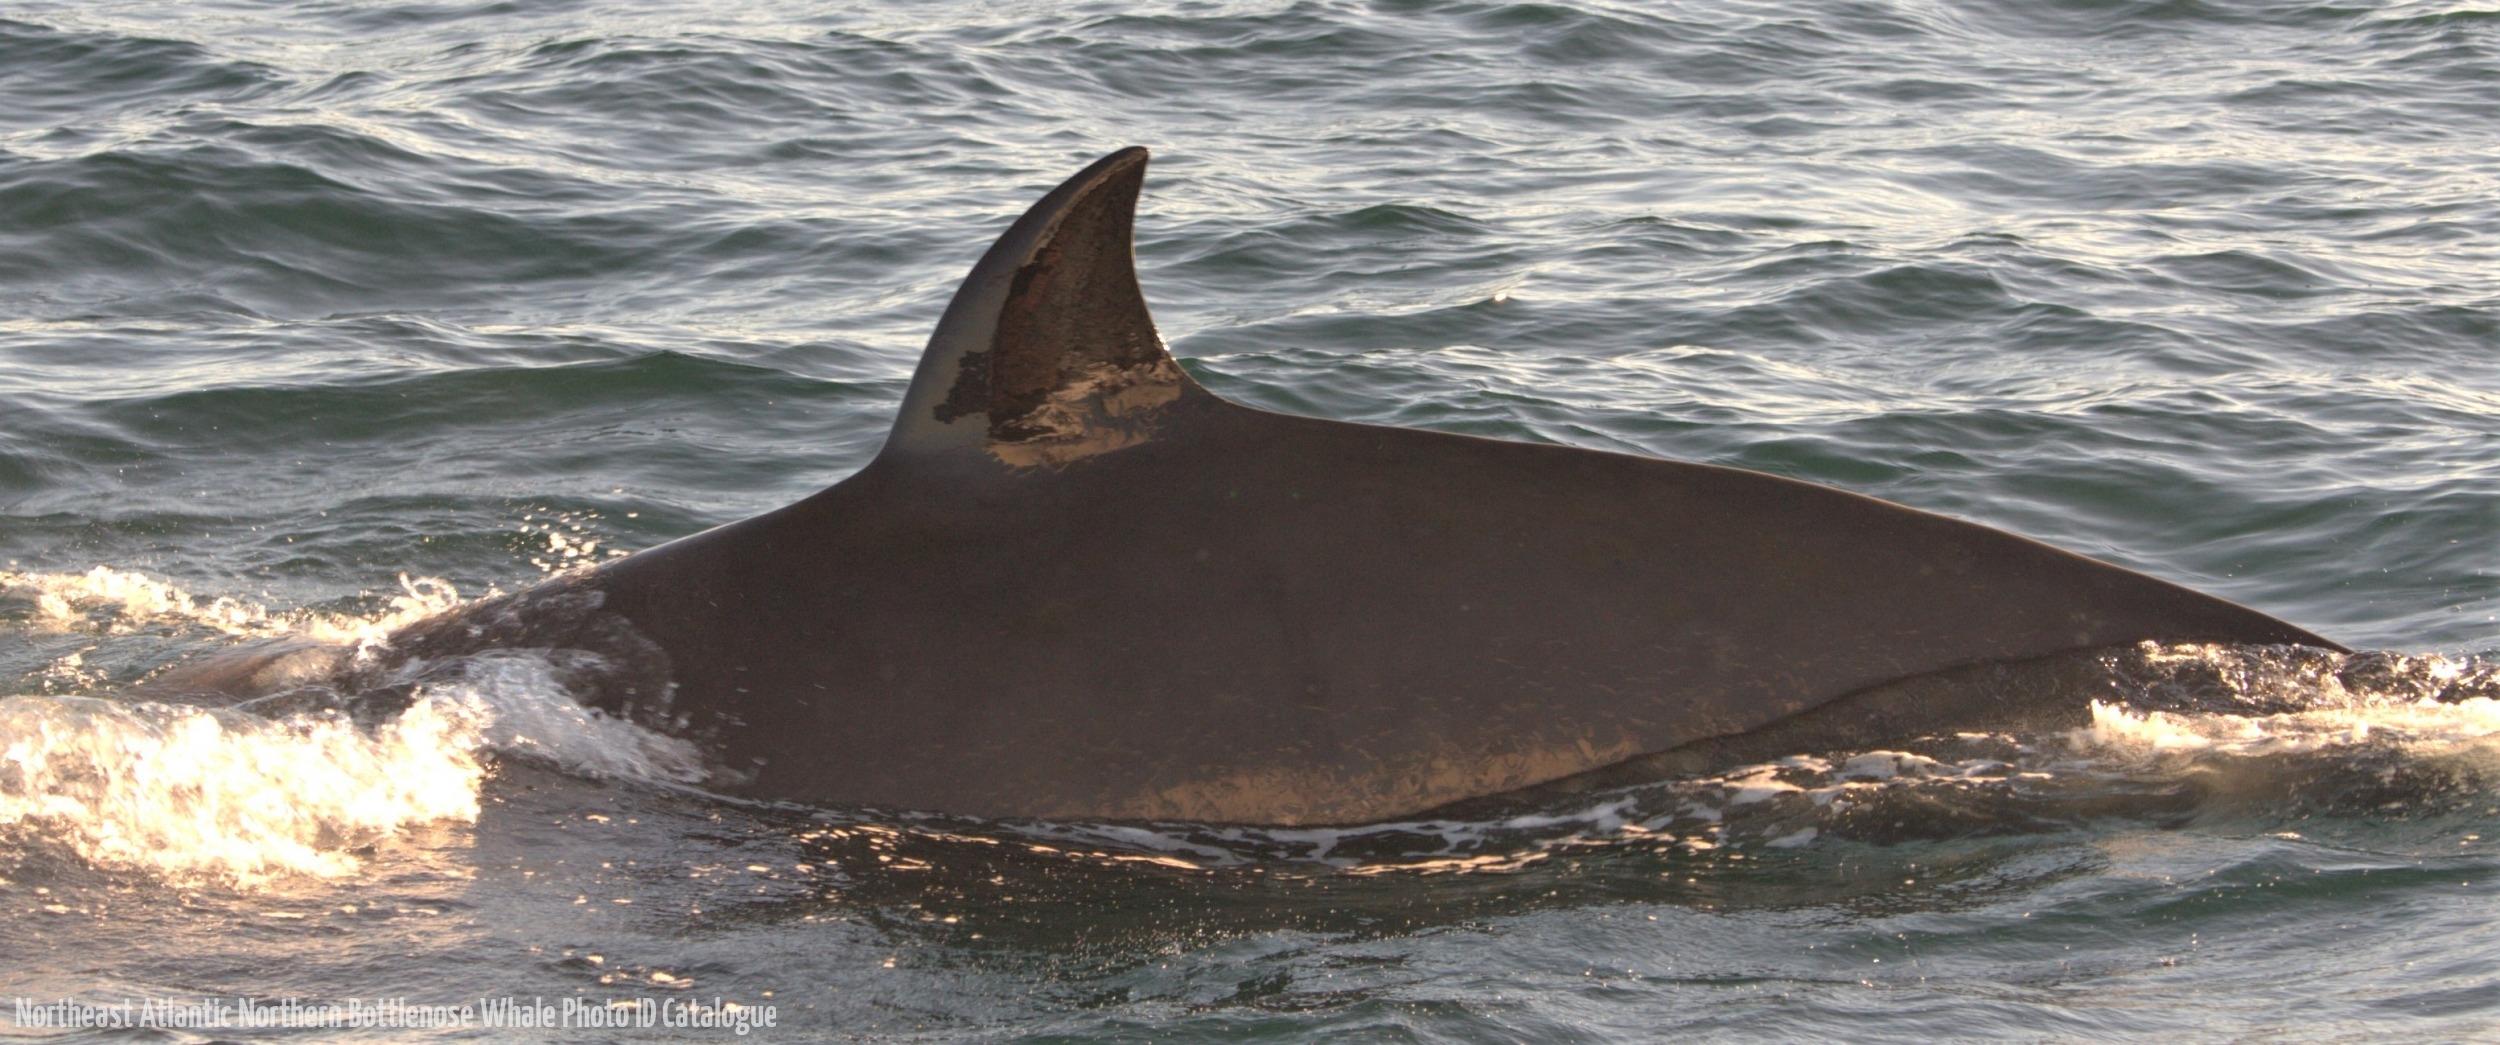 Whale ID: 0070,  Date: 15-06-2015,  Photographer: Joanna L. Kershaw